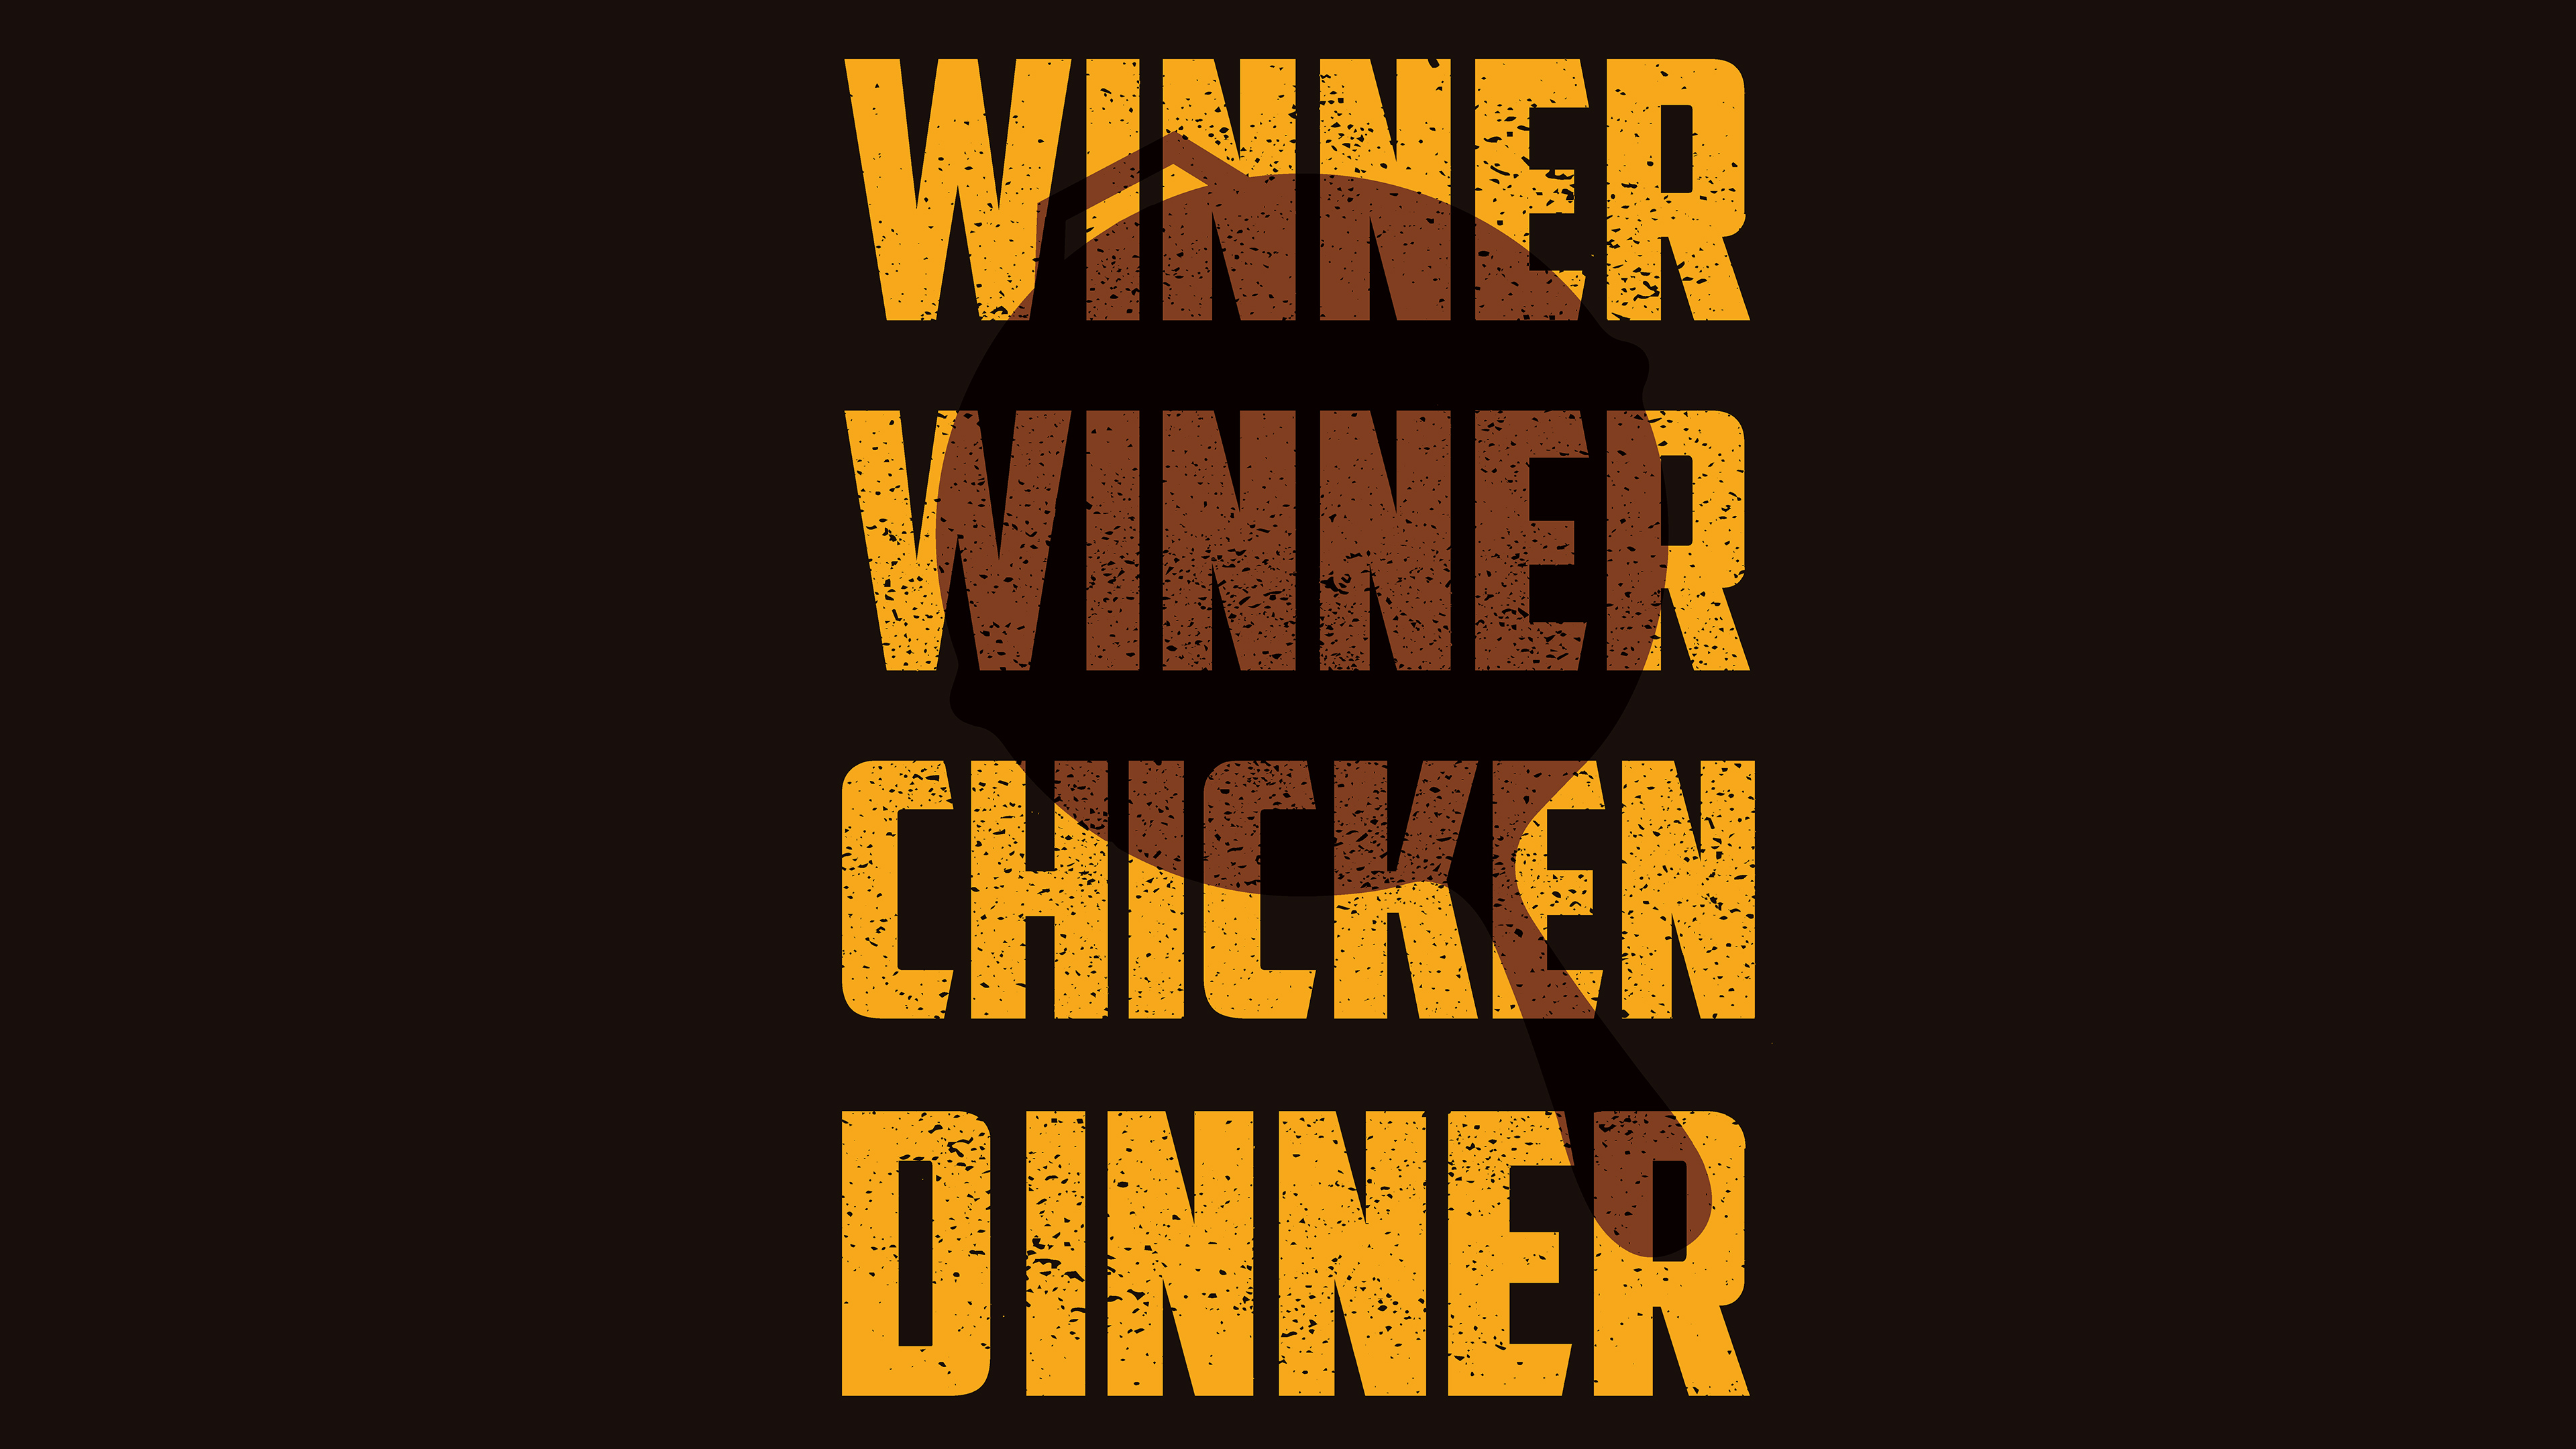 Winner Winner Chicken Dinner Hd Games 4k Wallpapers